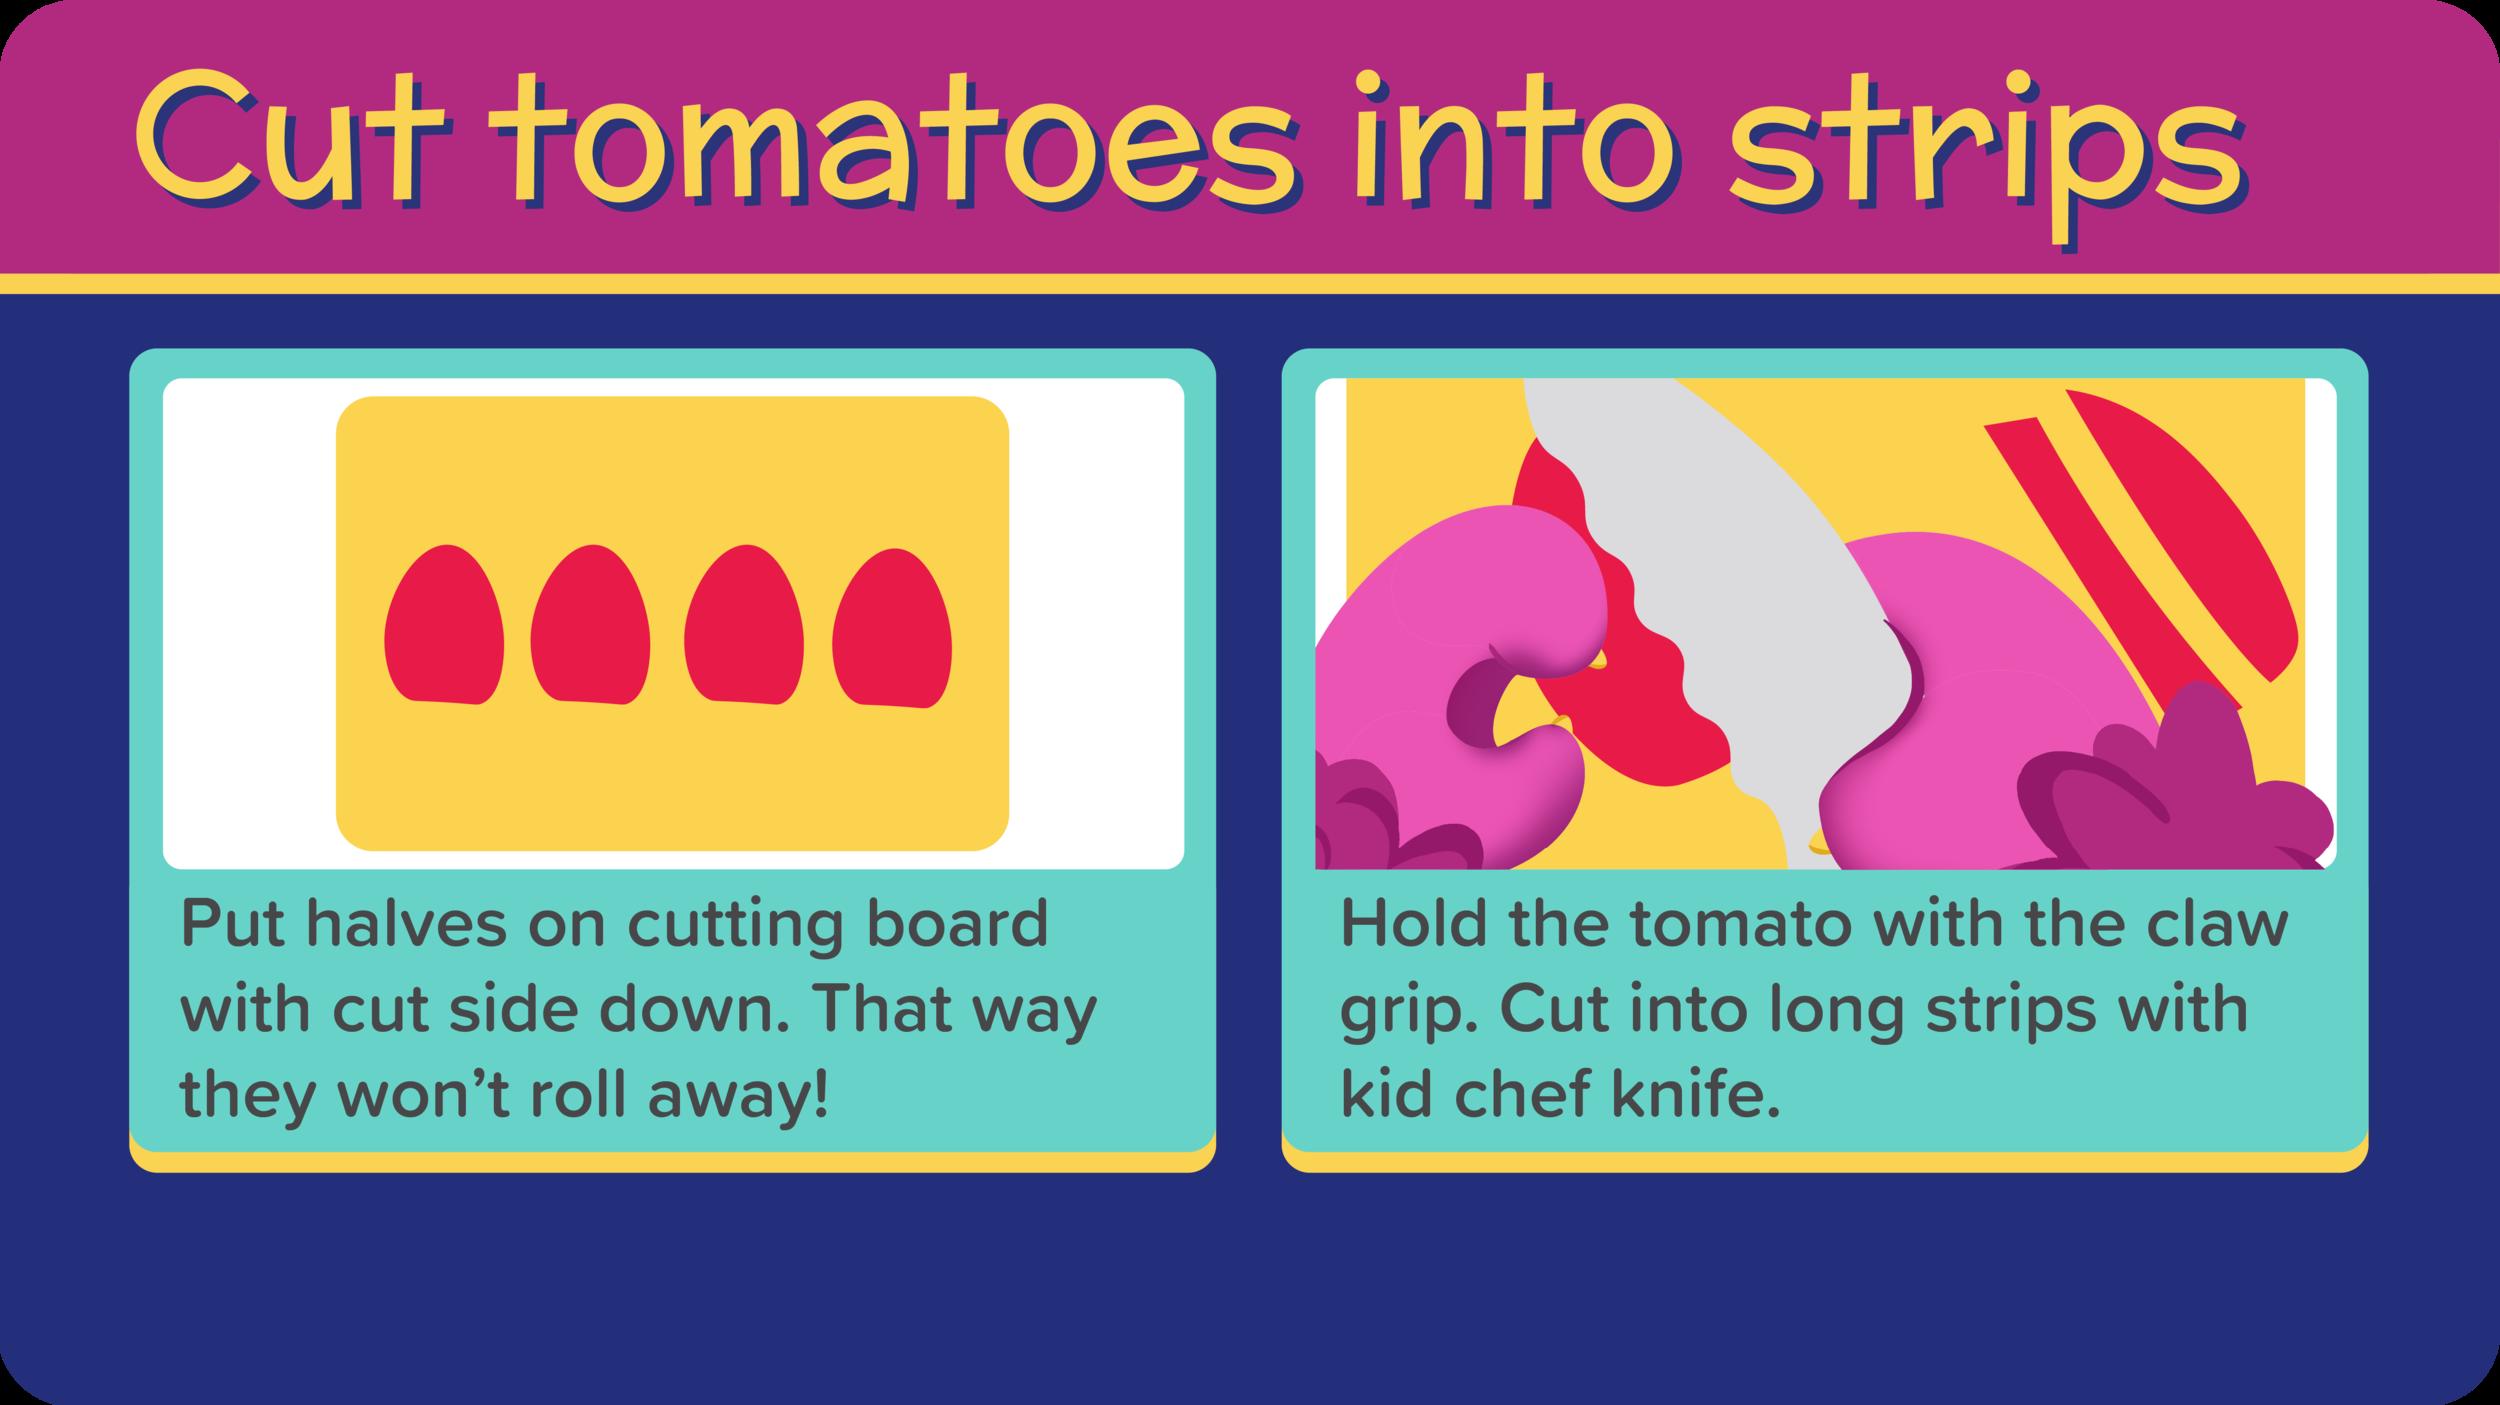 19_GreatGreenGuacamole_cut tomatoes in strips-01.png